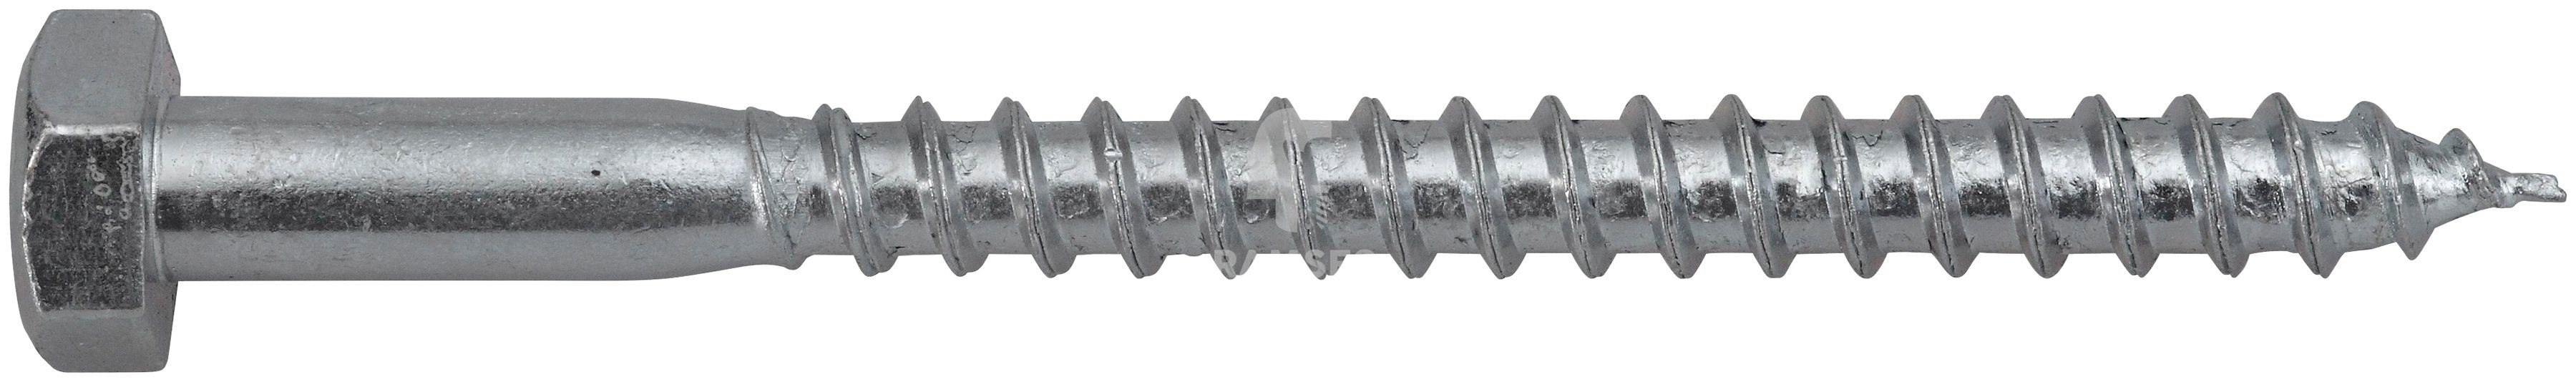 RAMSES Schrauben , Sechskant-Holzschraube 10 x 220 mm 10 Stk.